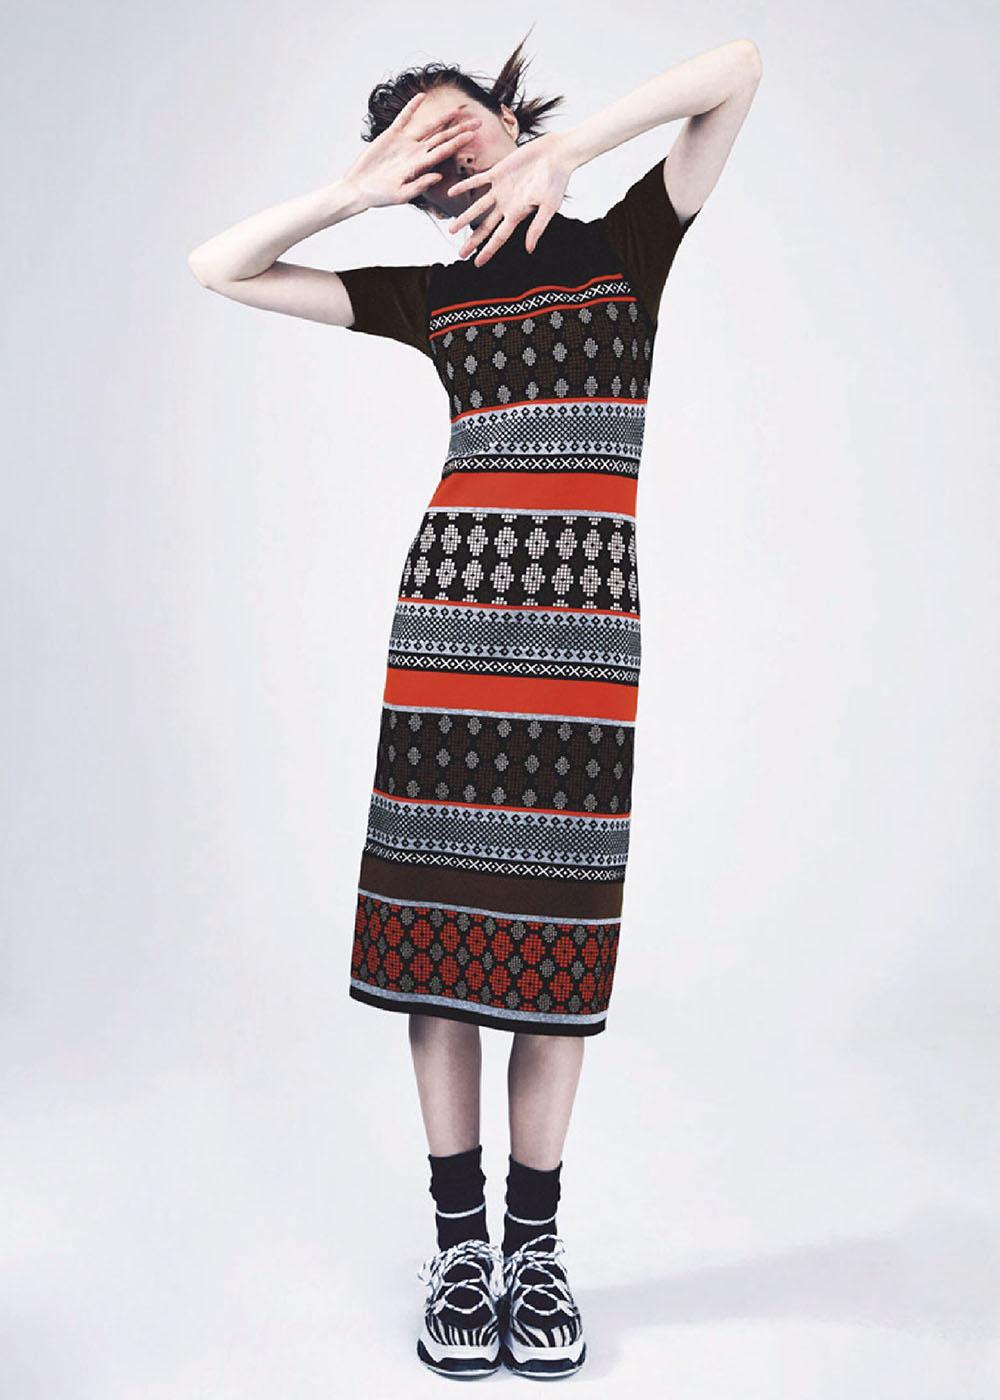 Daria Milky by Onur Dağ for Elle Turkey December 2020 January 2021